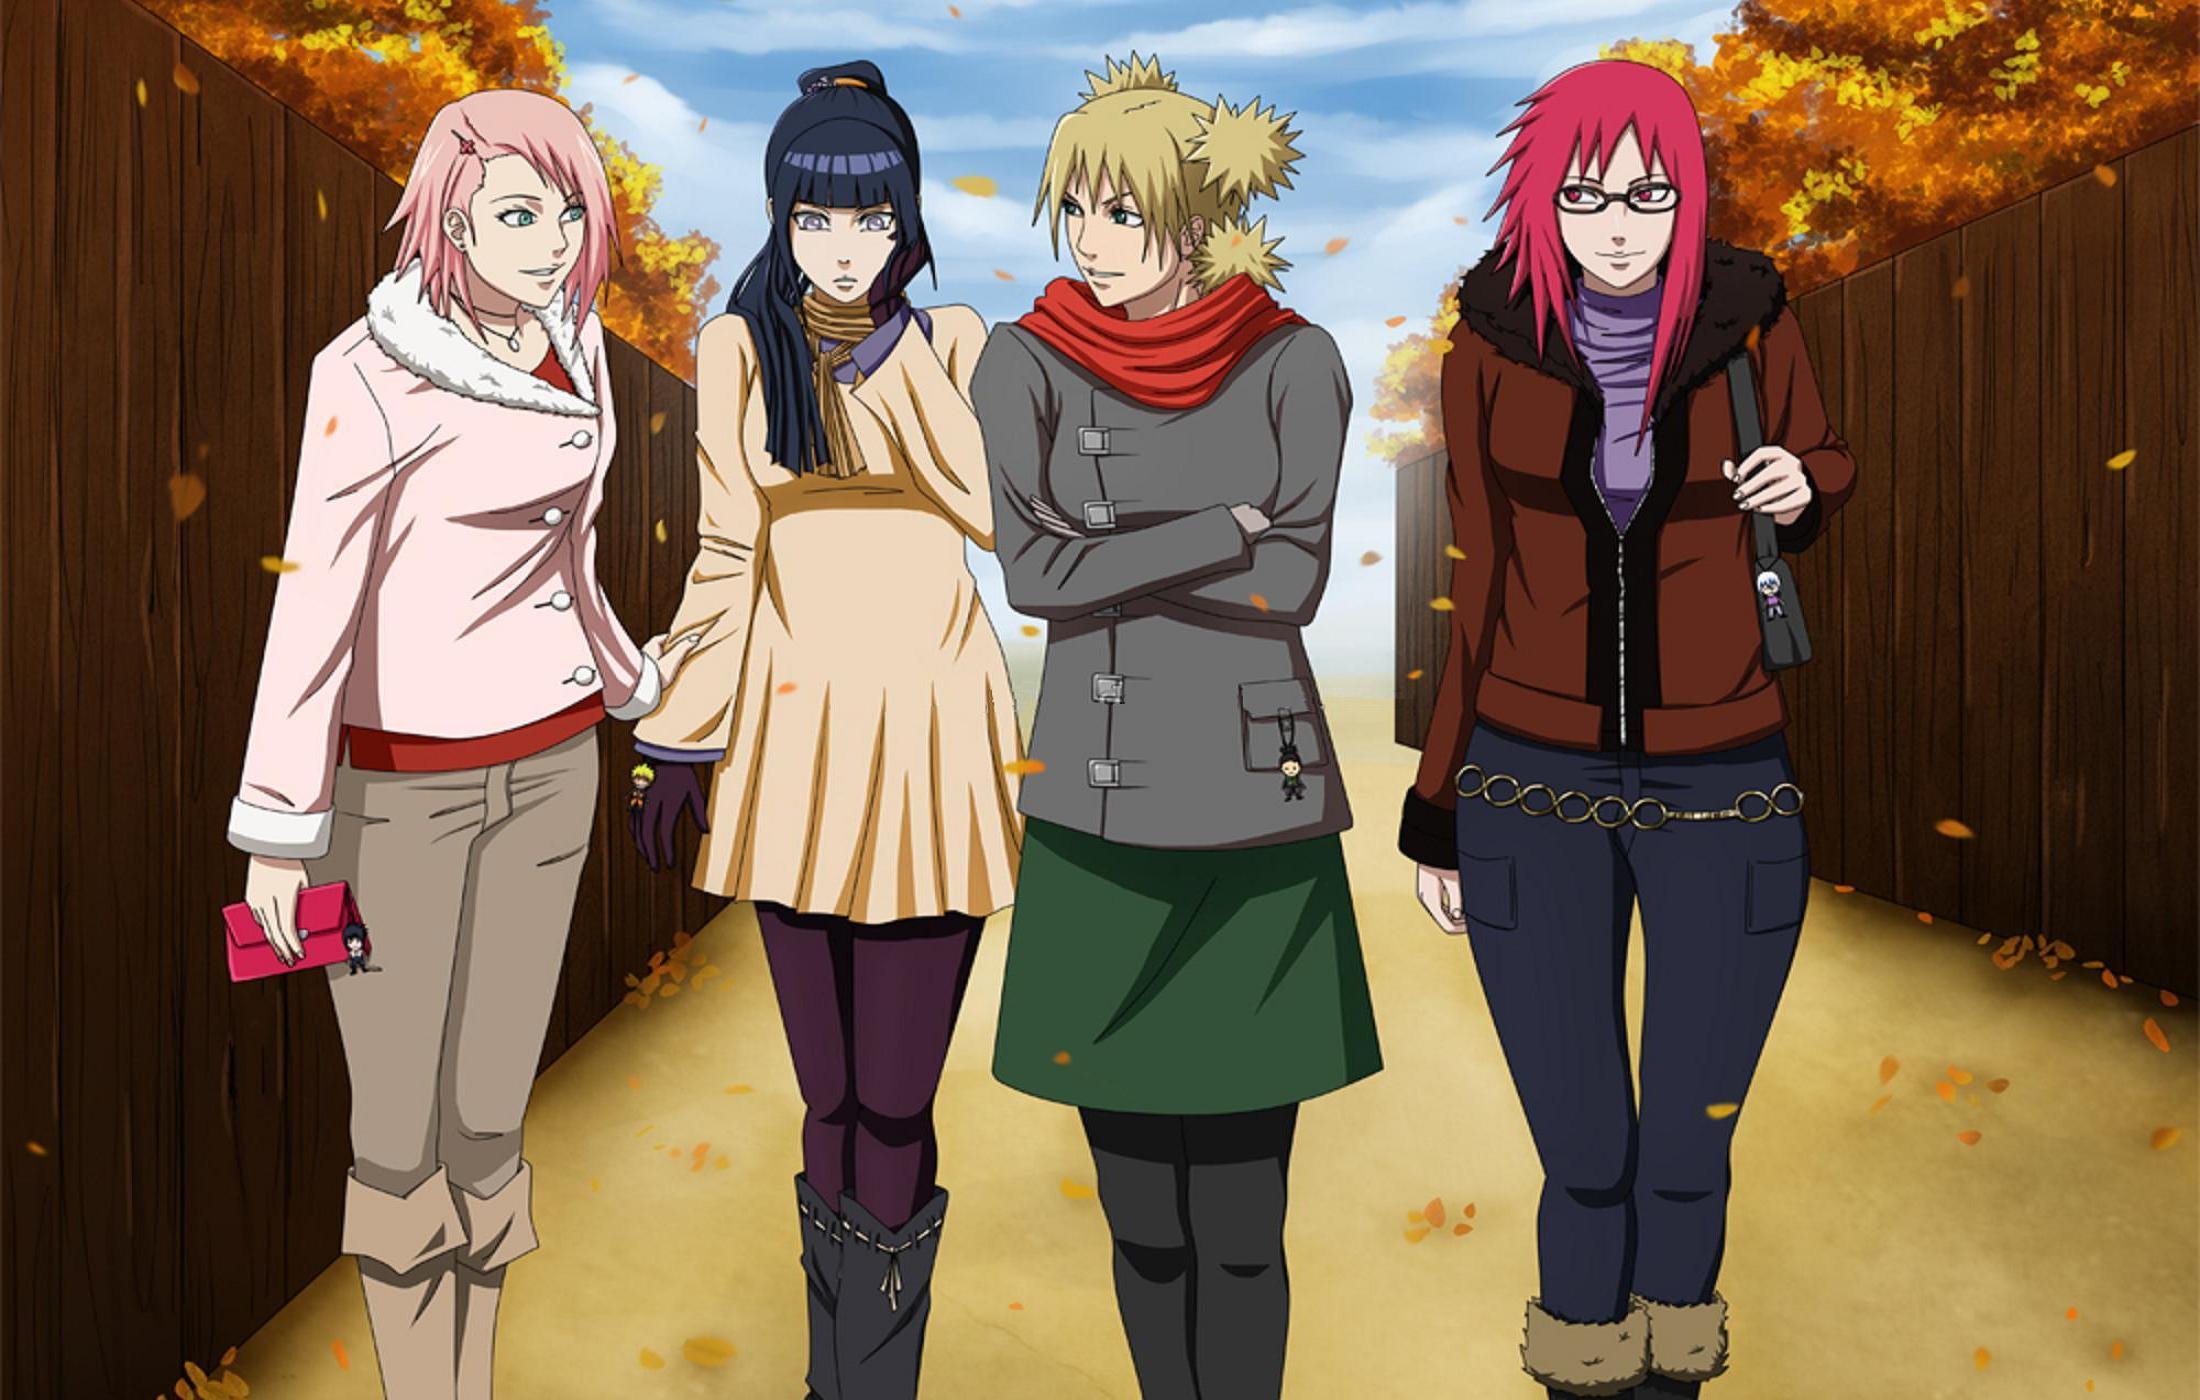 Naruto shippuden english dubbed - b